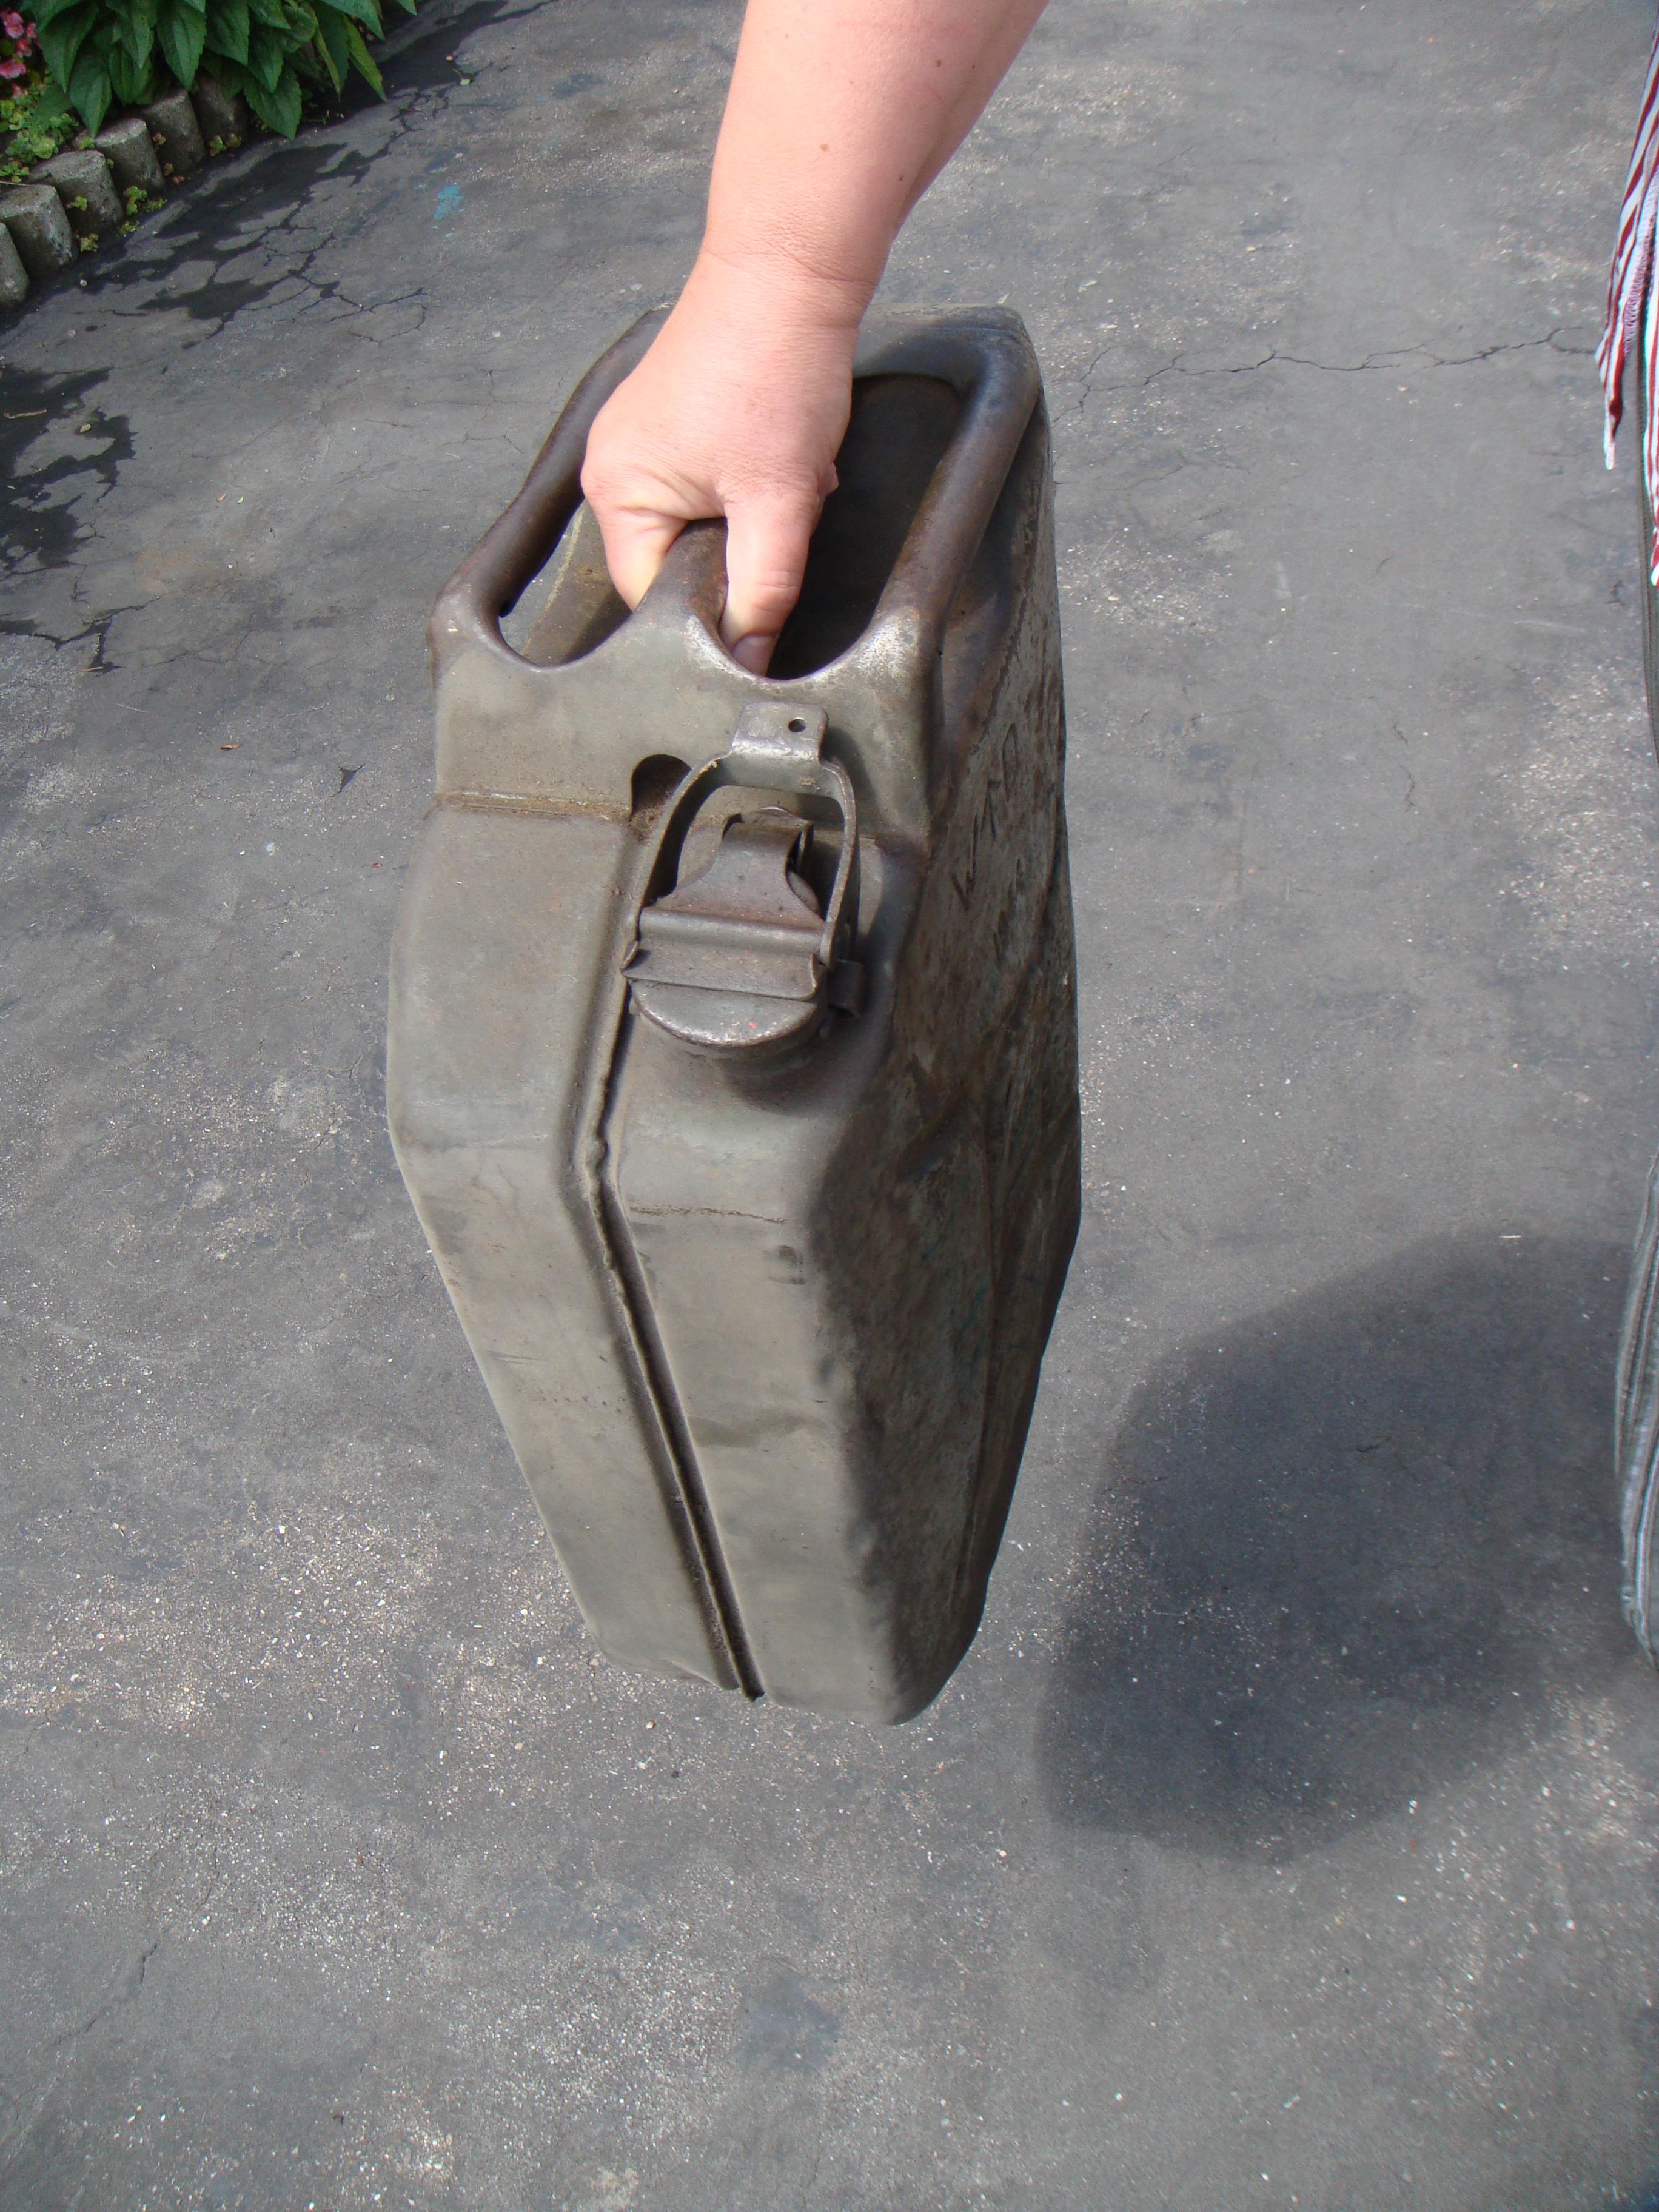 Image from https://en.wikipedia.org/wiki/Jerrycan